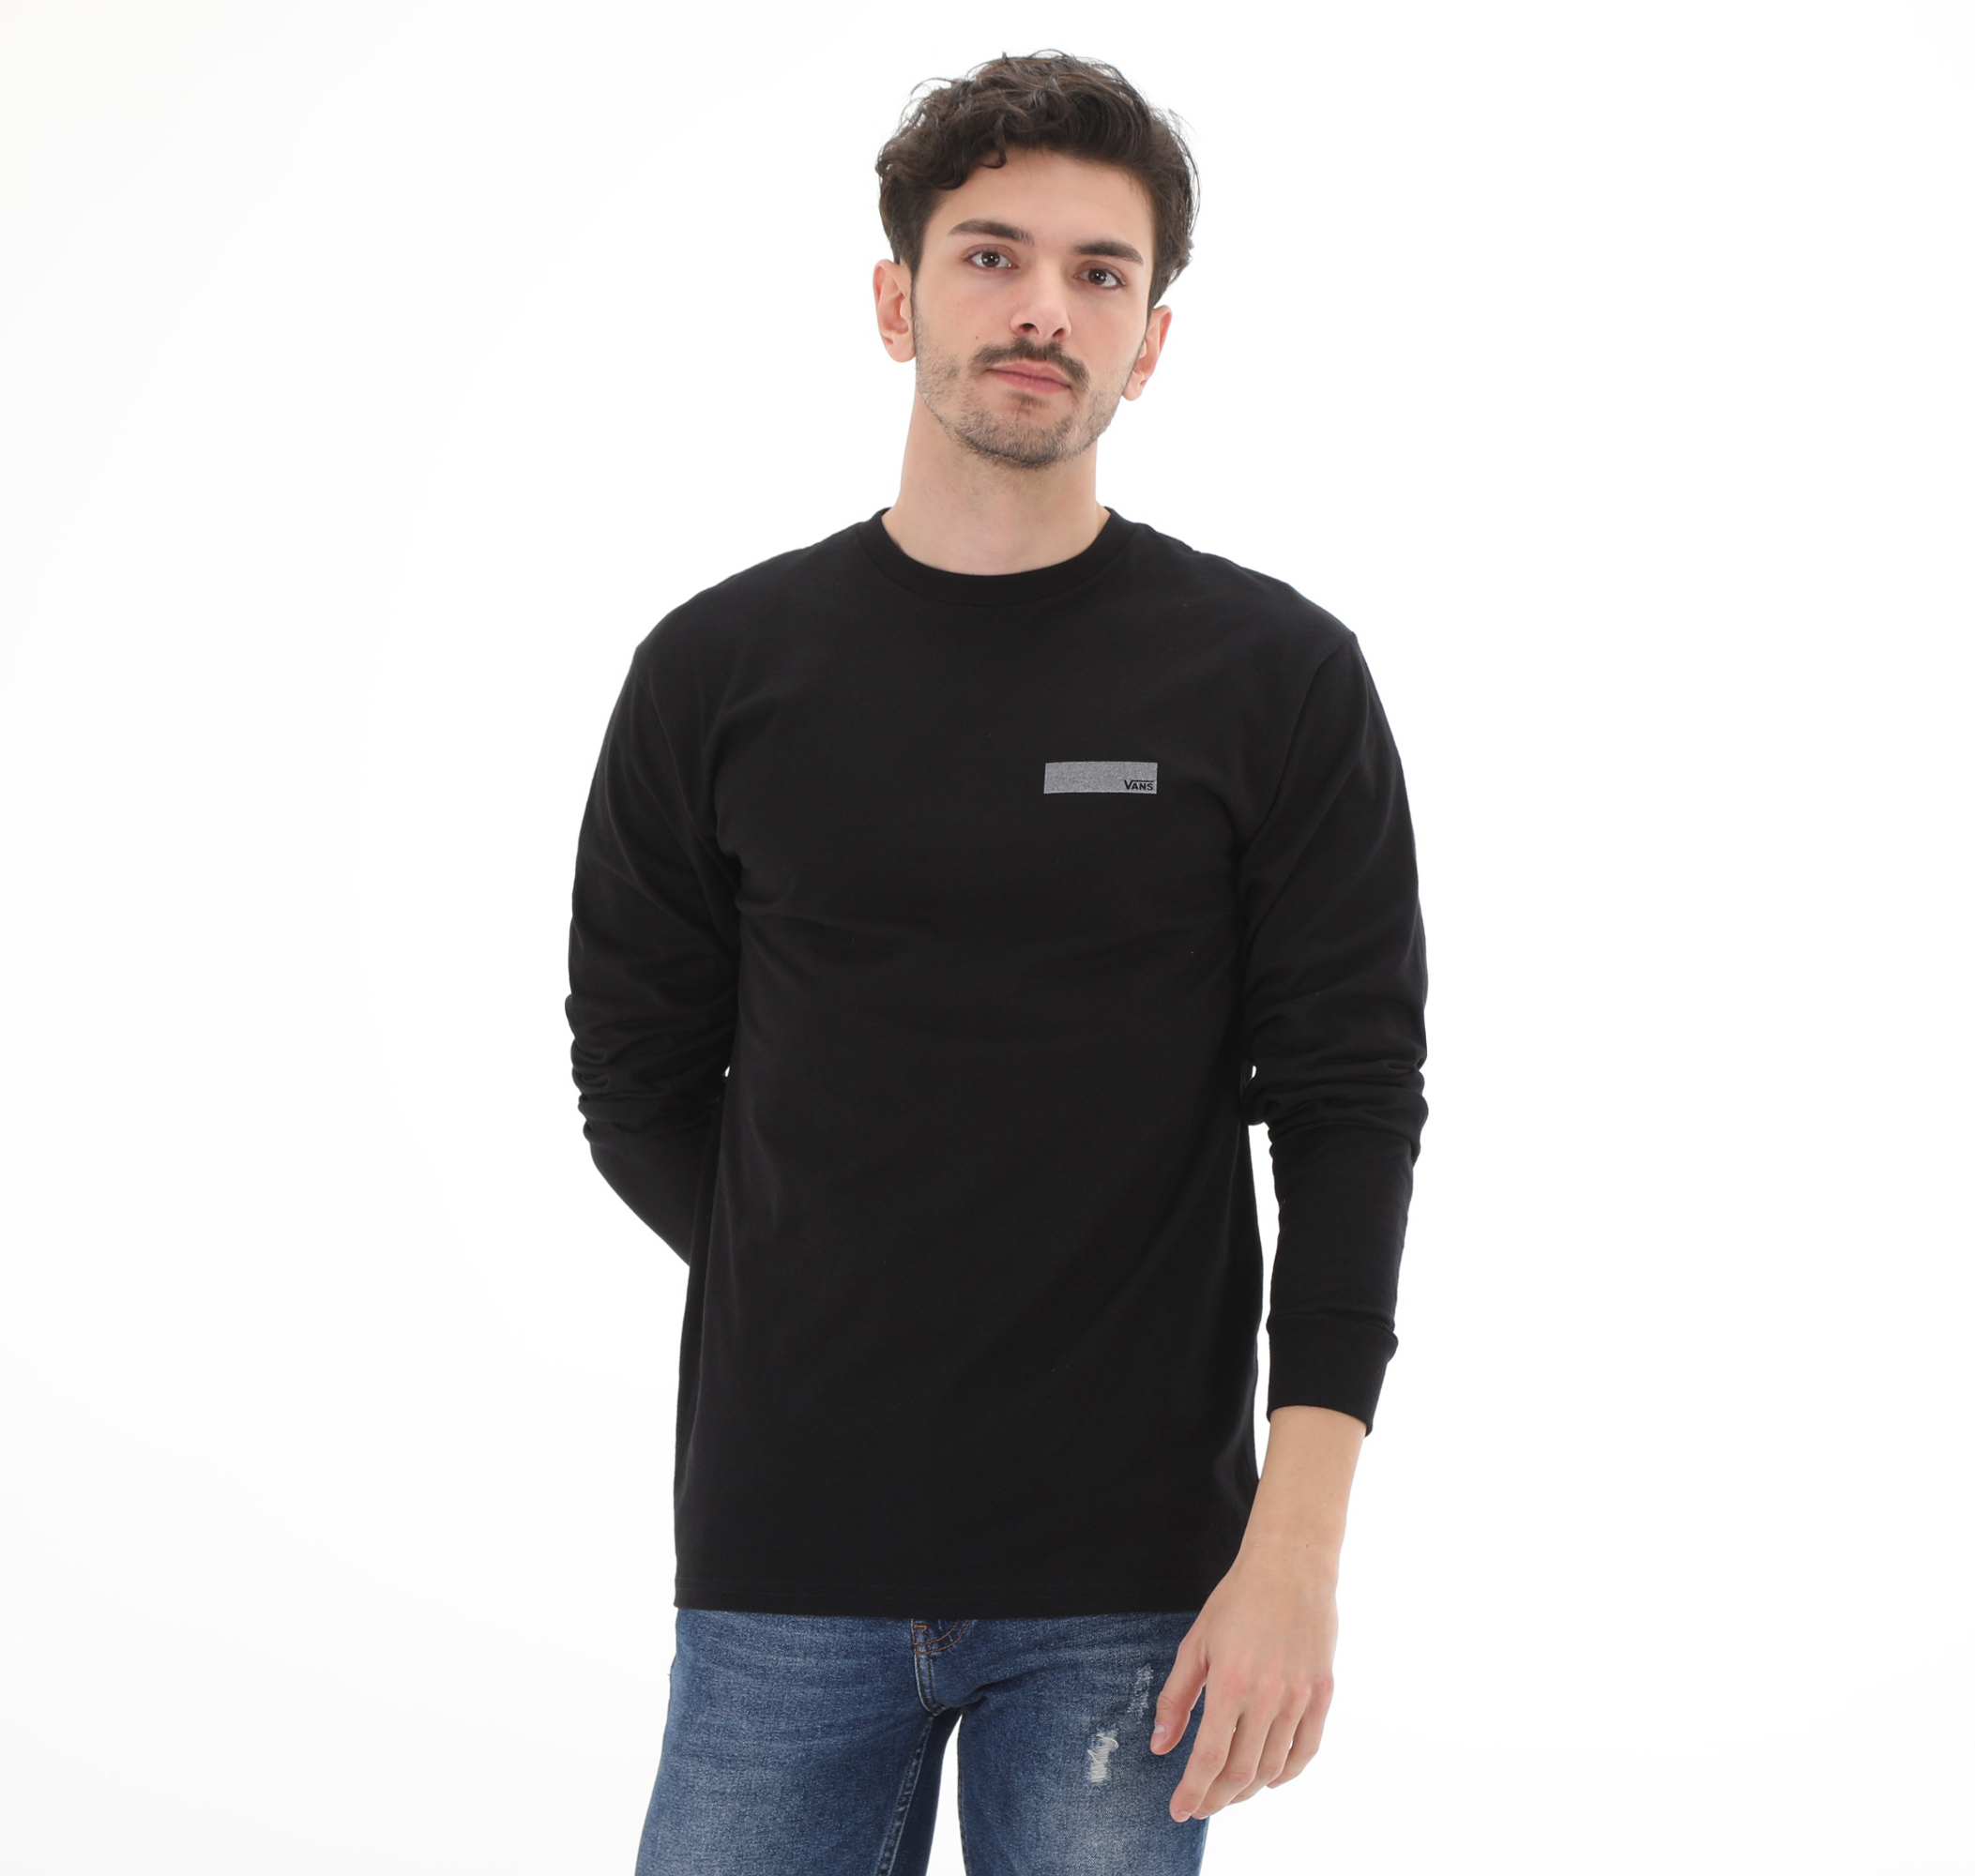 Pro Skate Reflectıve Ls Erkek Sweatshirt Siyah